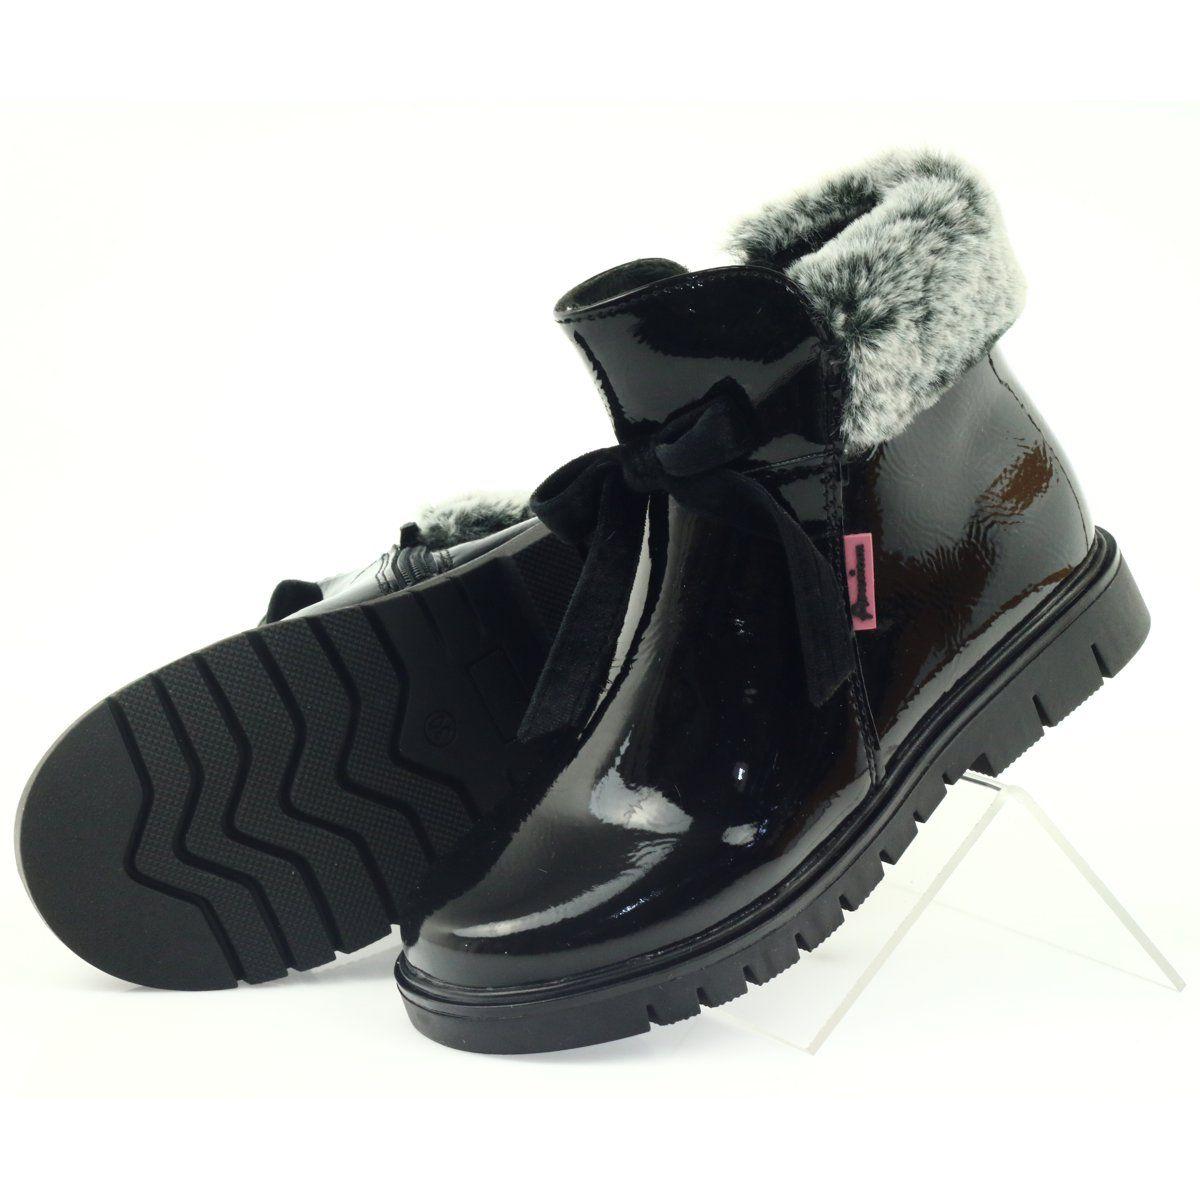 American Club American Kozaki Botki Buty Zimowe 18015 Czarne Boots Shoes Winter Boot